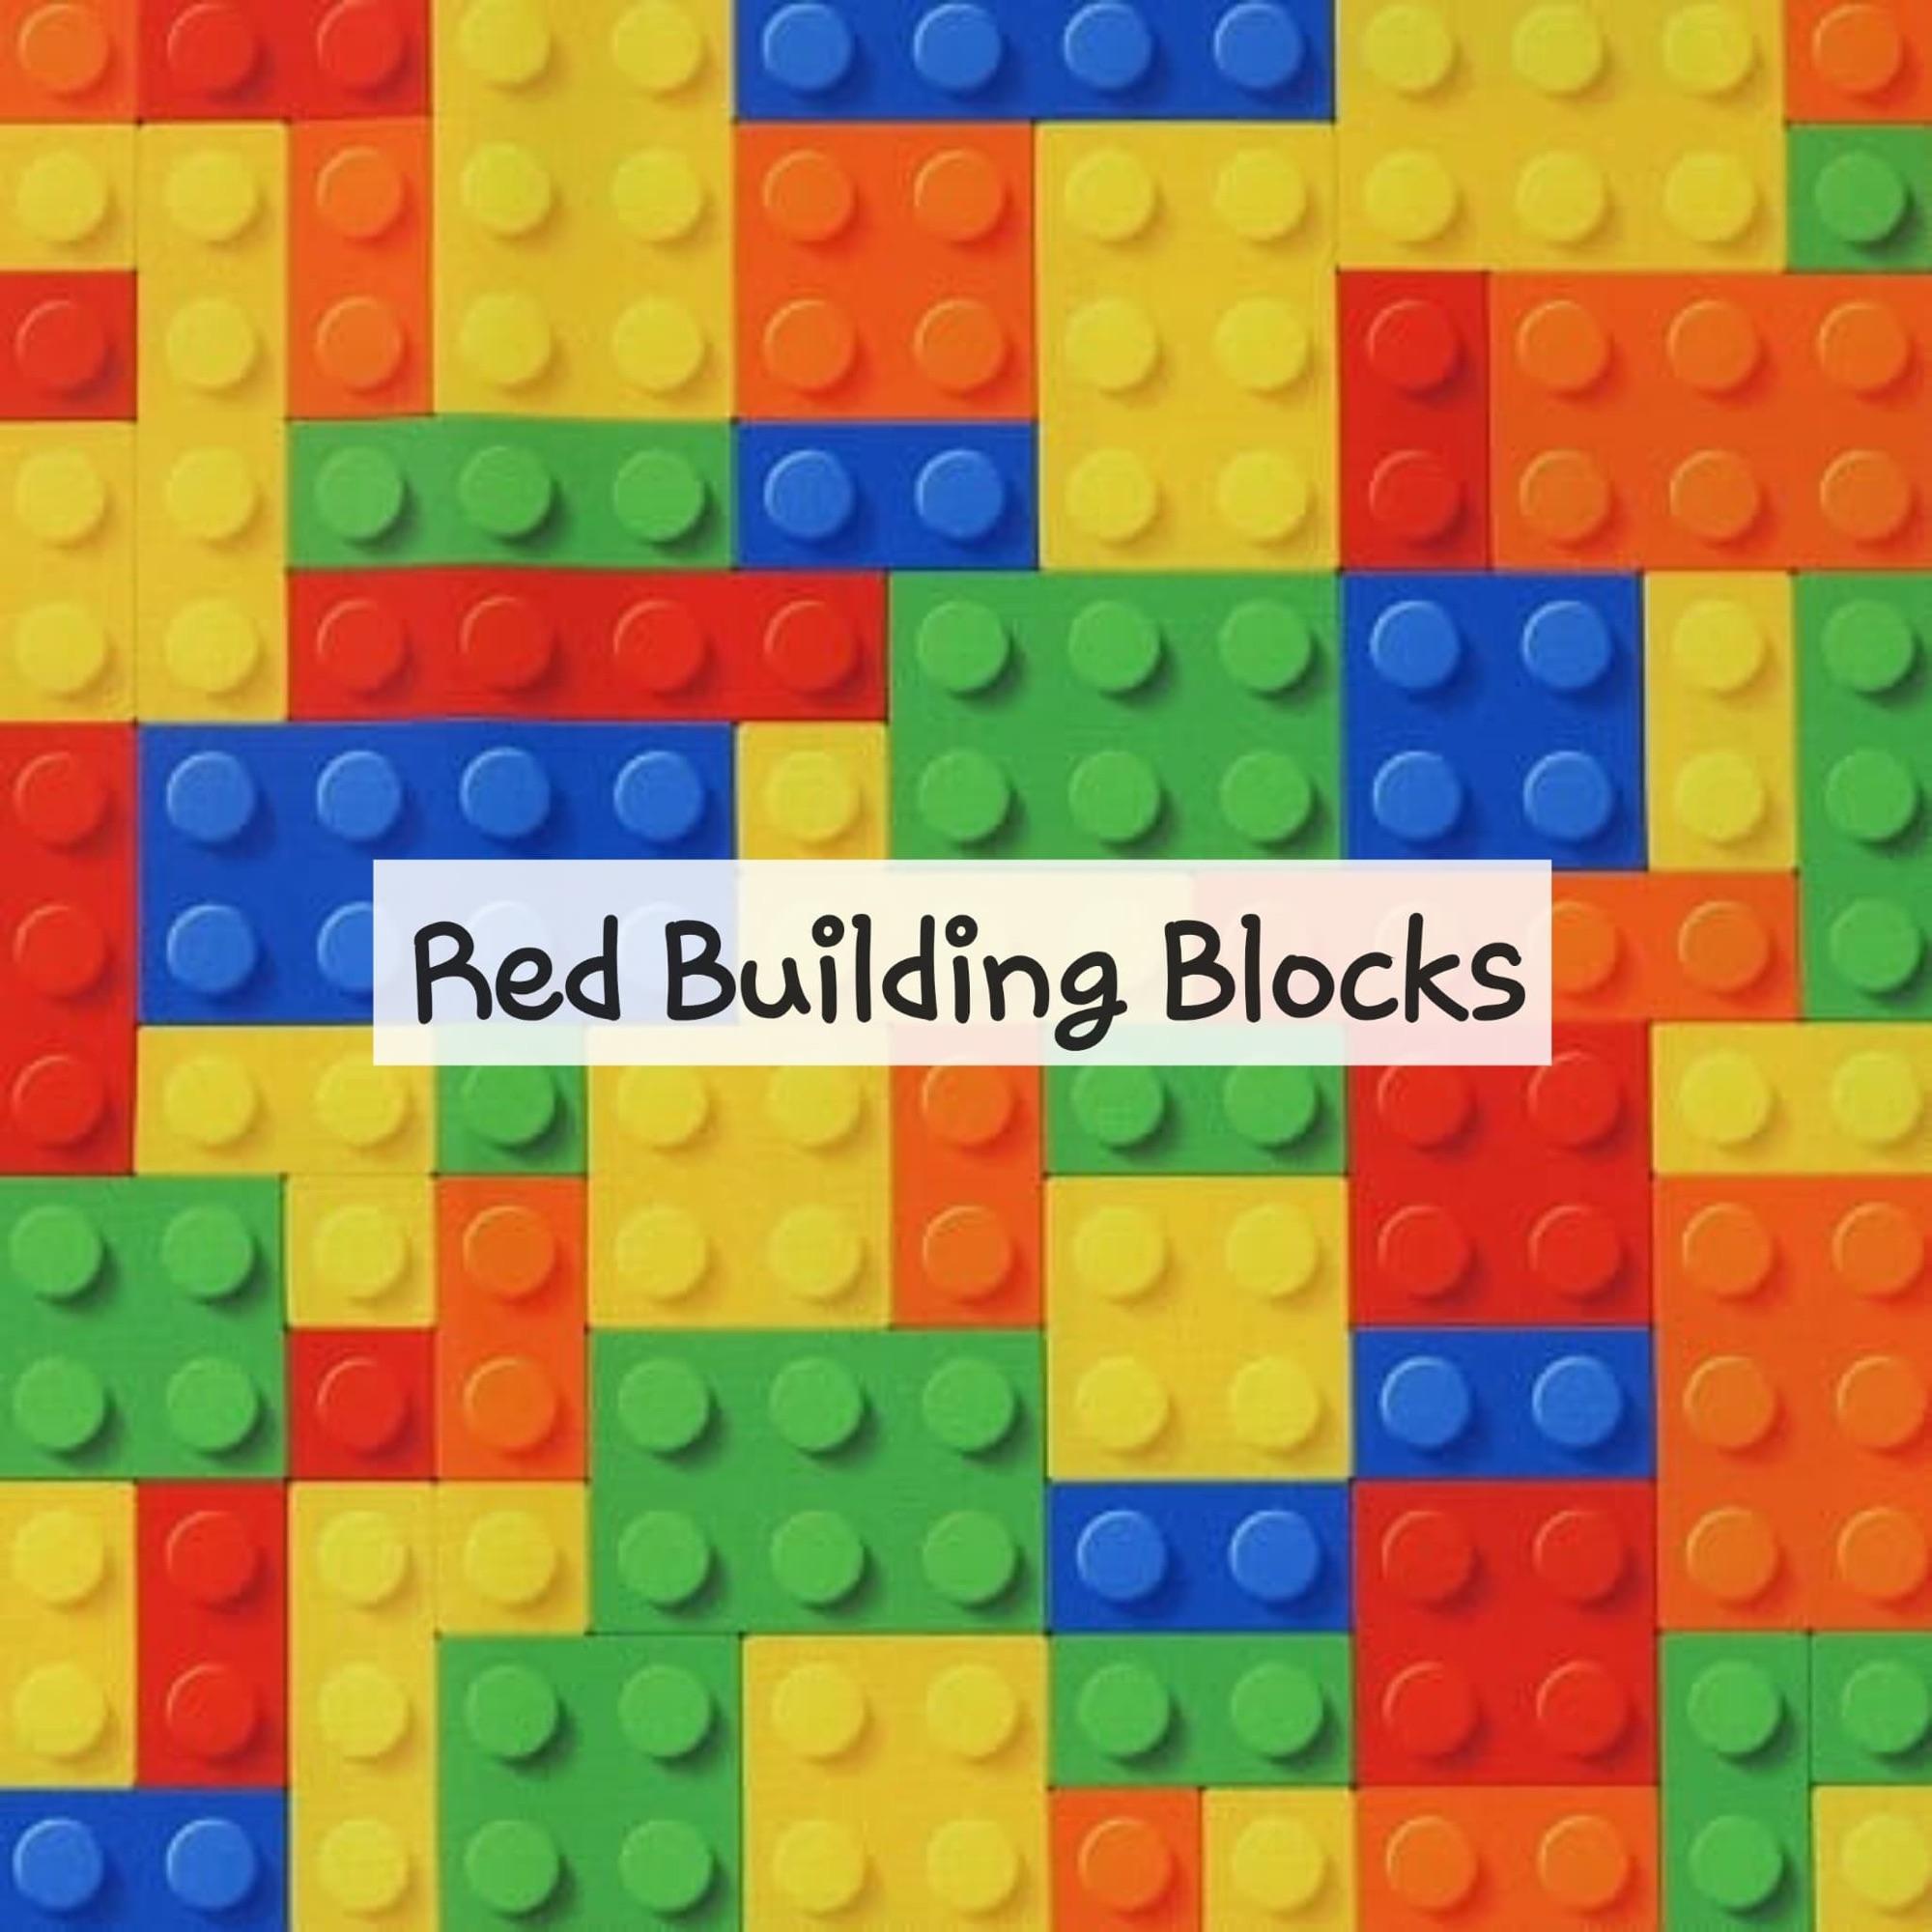 Red Building Blocks